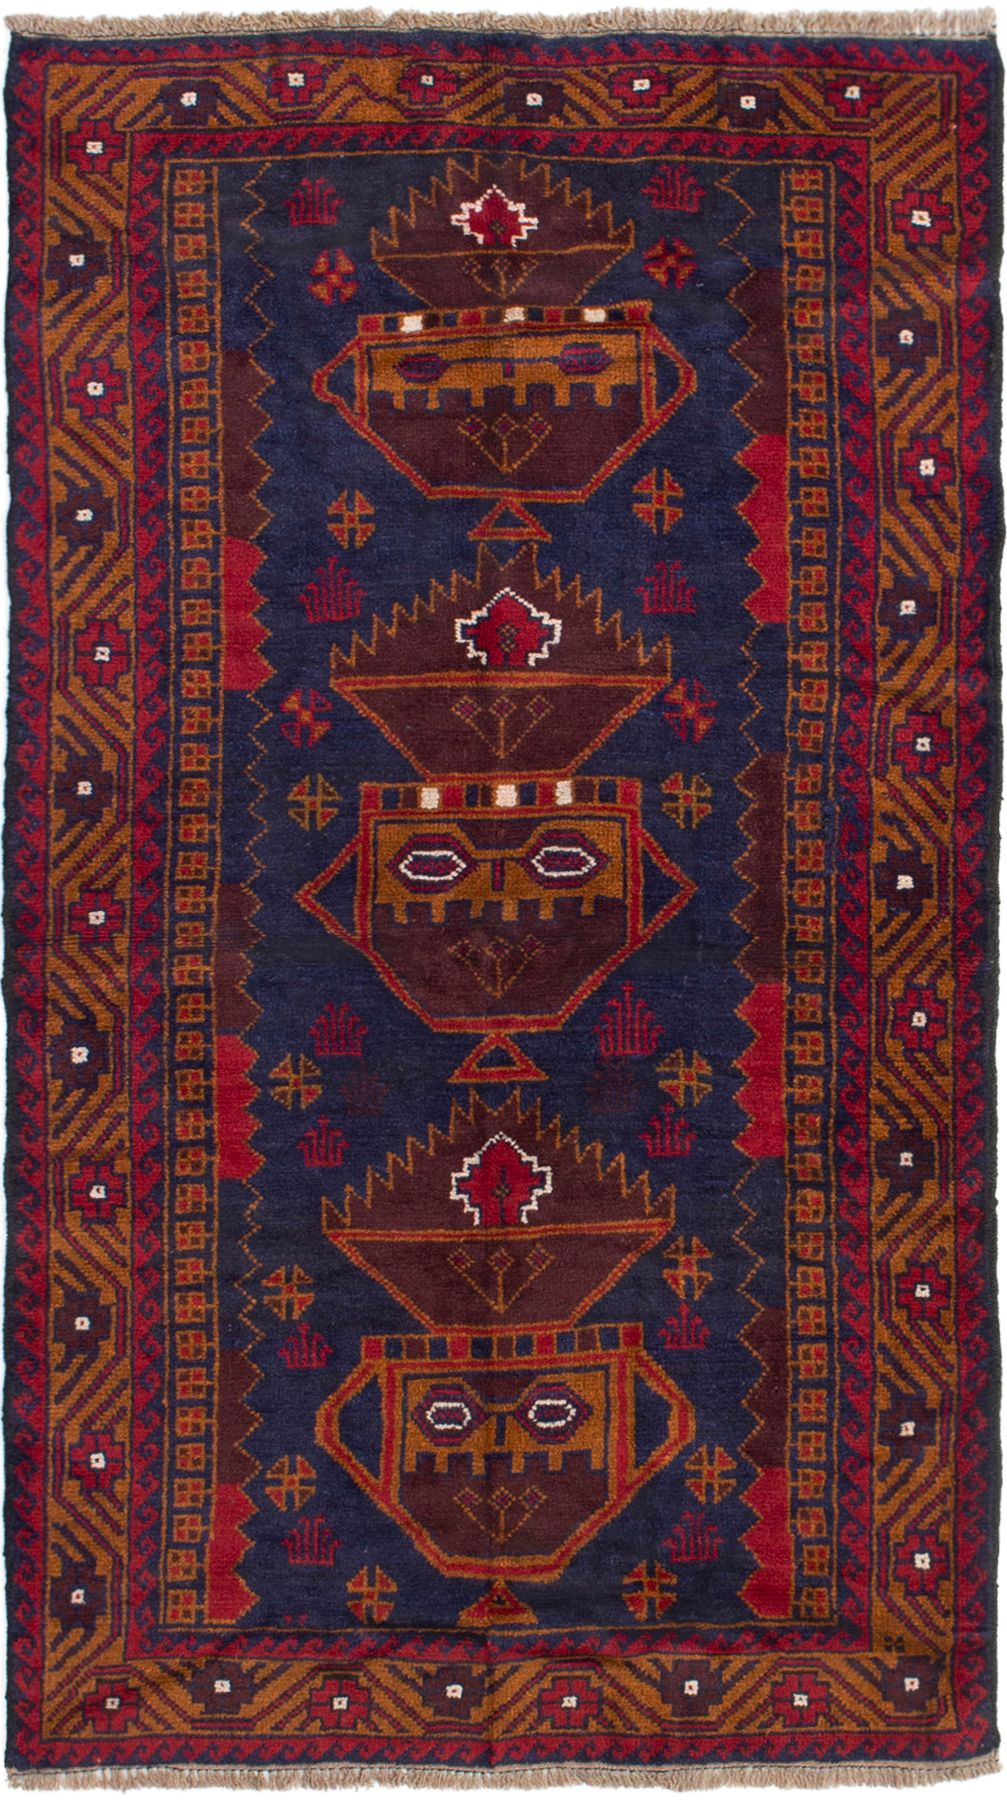 "Hand-knotted Teimani Dark Blue Wool Rug 3'3"" x 6'0"" Size: 3'3"" x 6'0"""